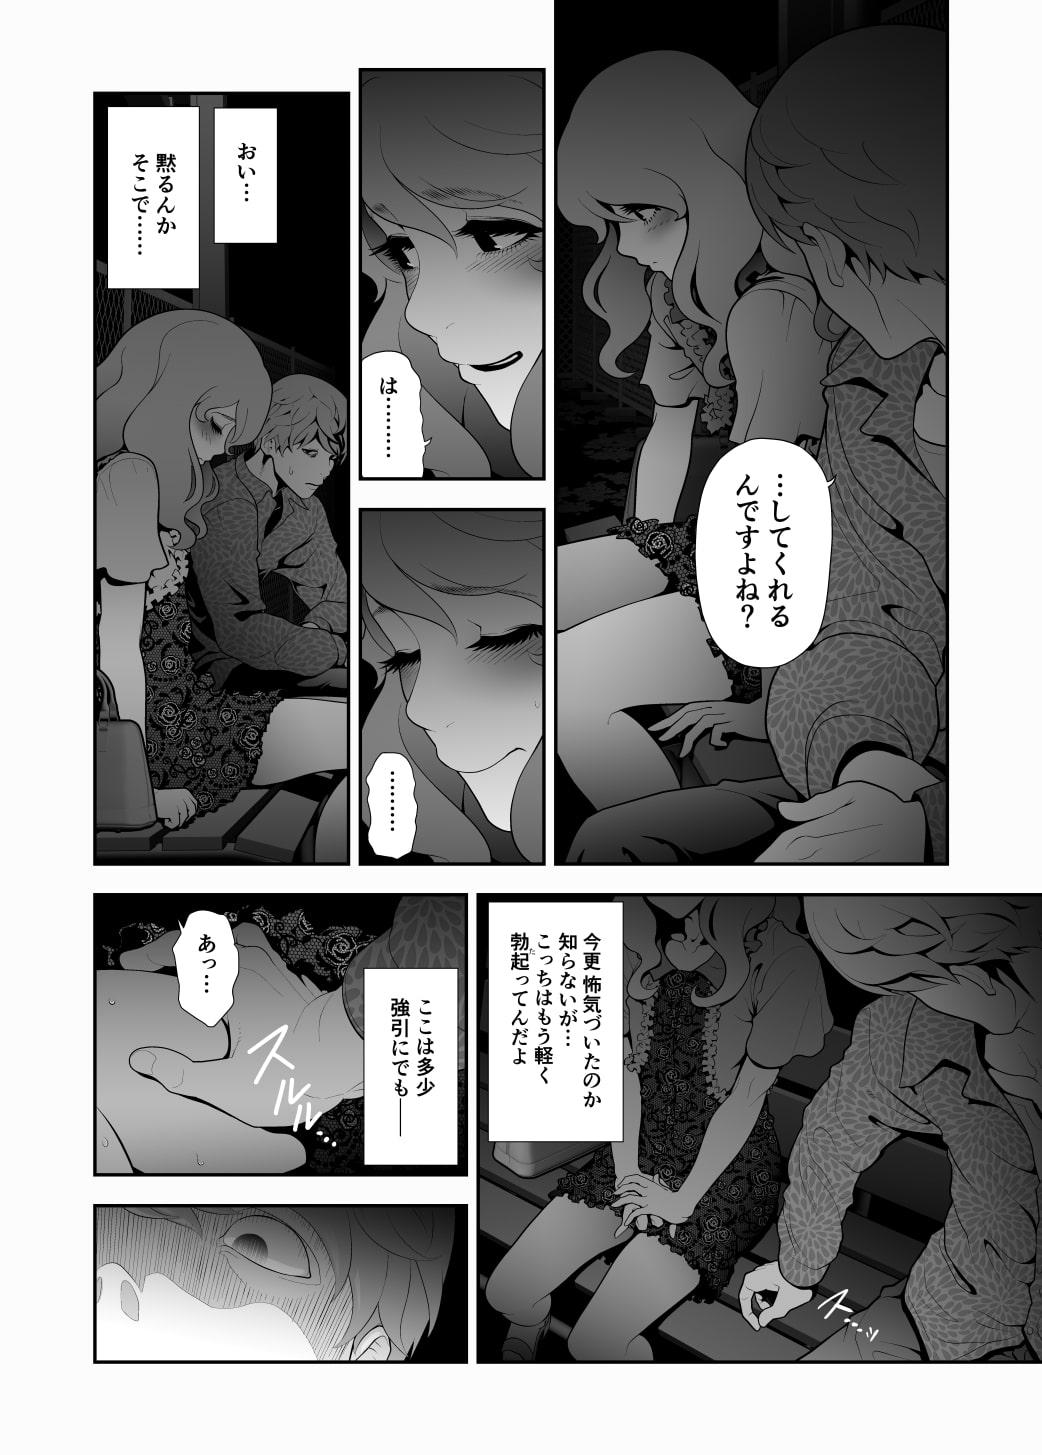 女装子ハッテン系 ≪春原市東部浄水場 篇≫